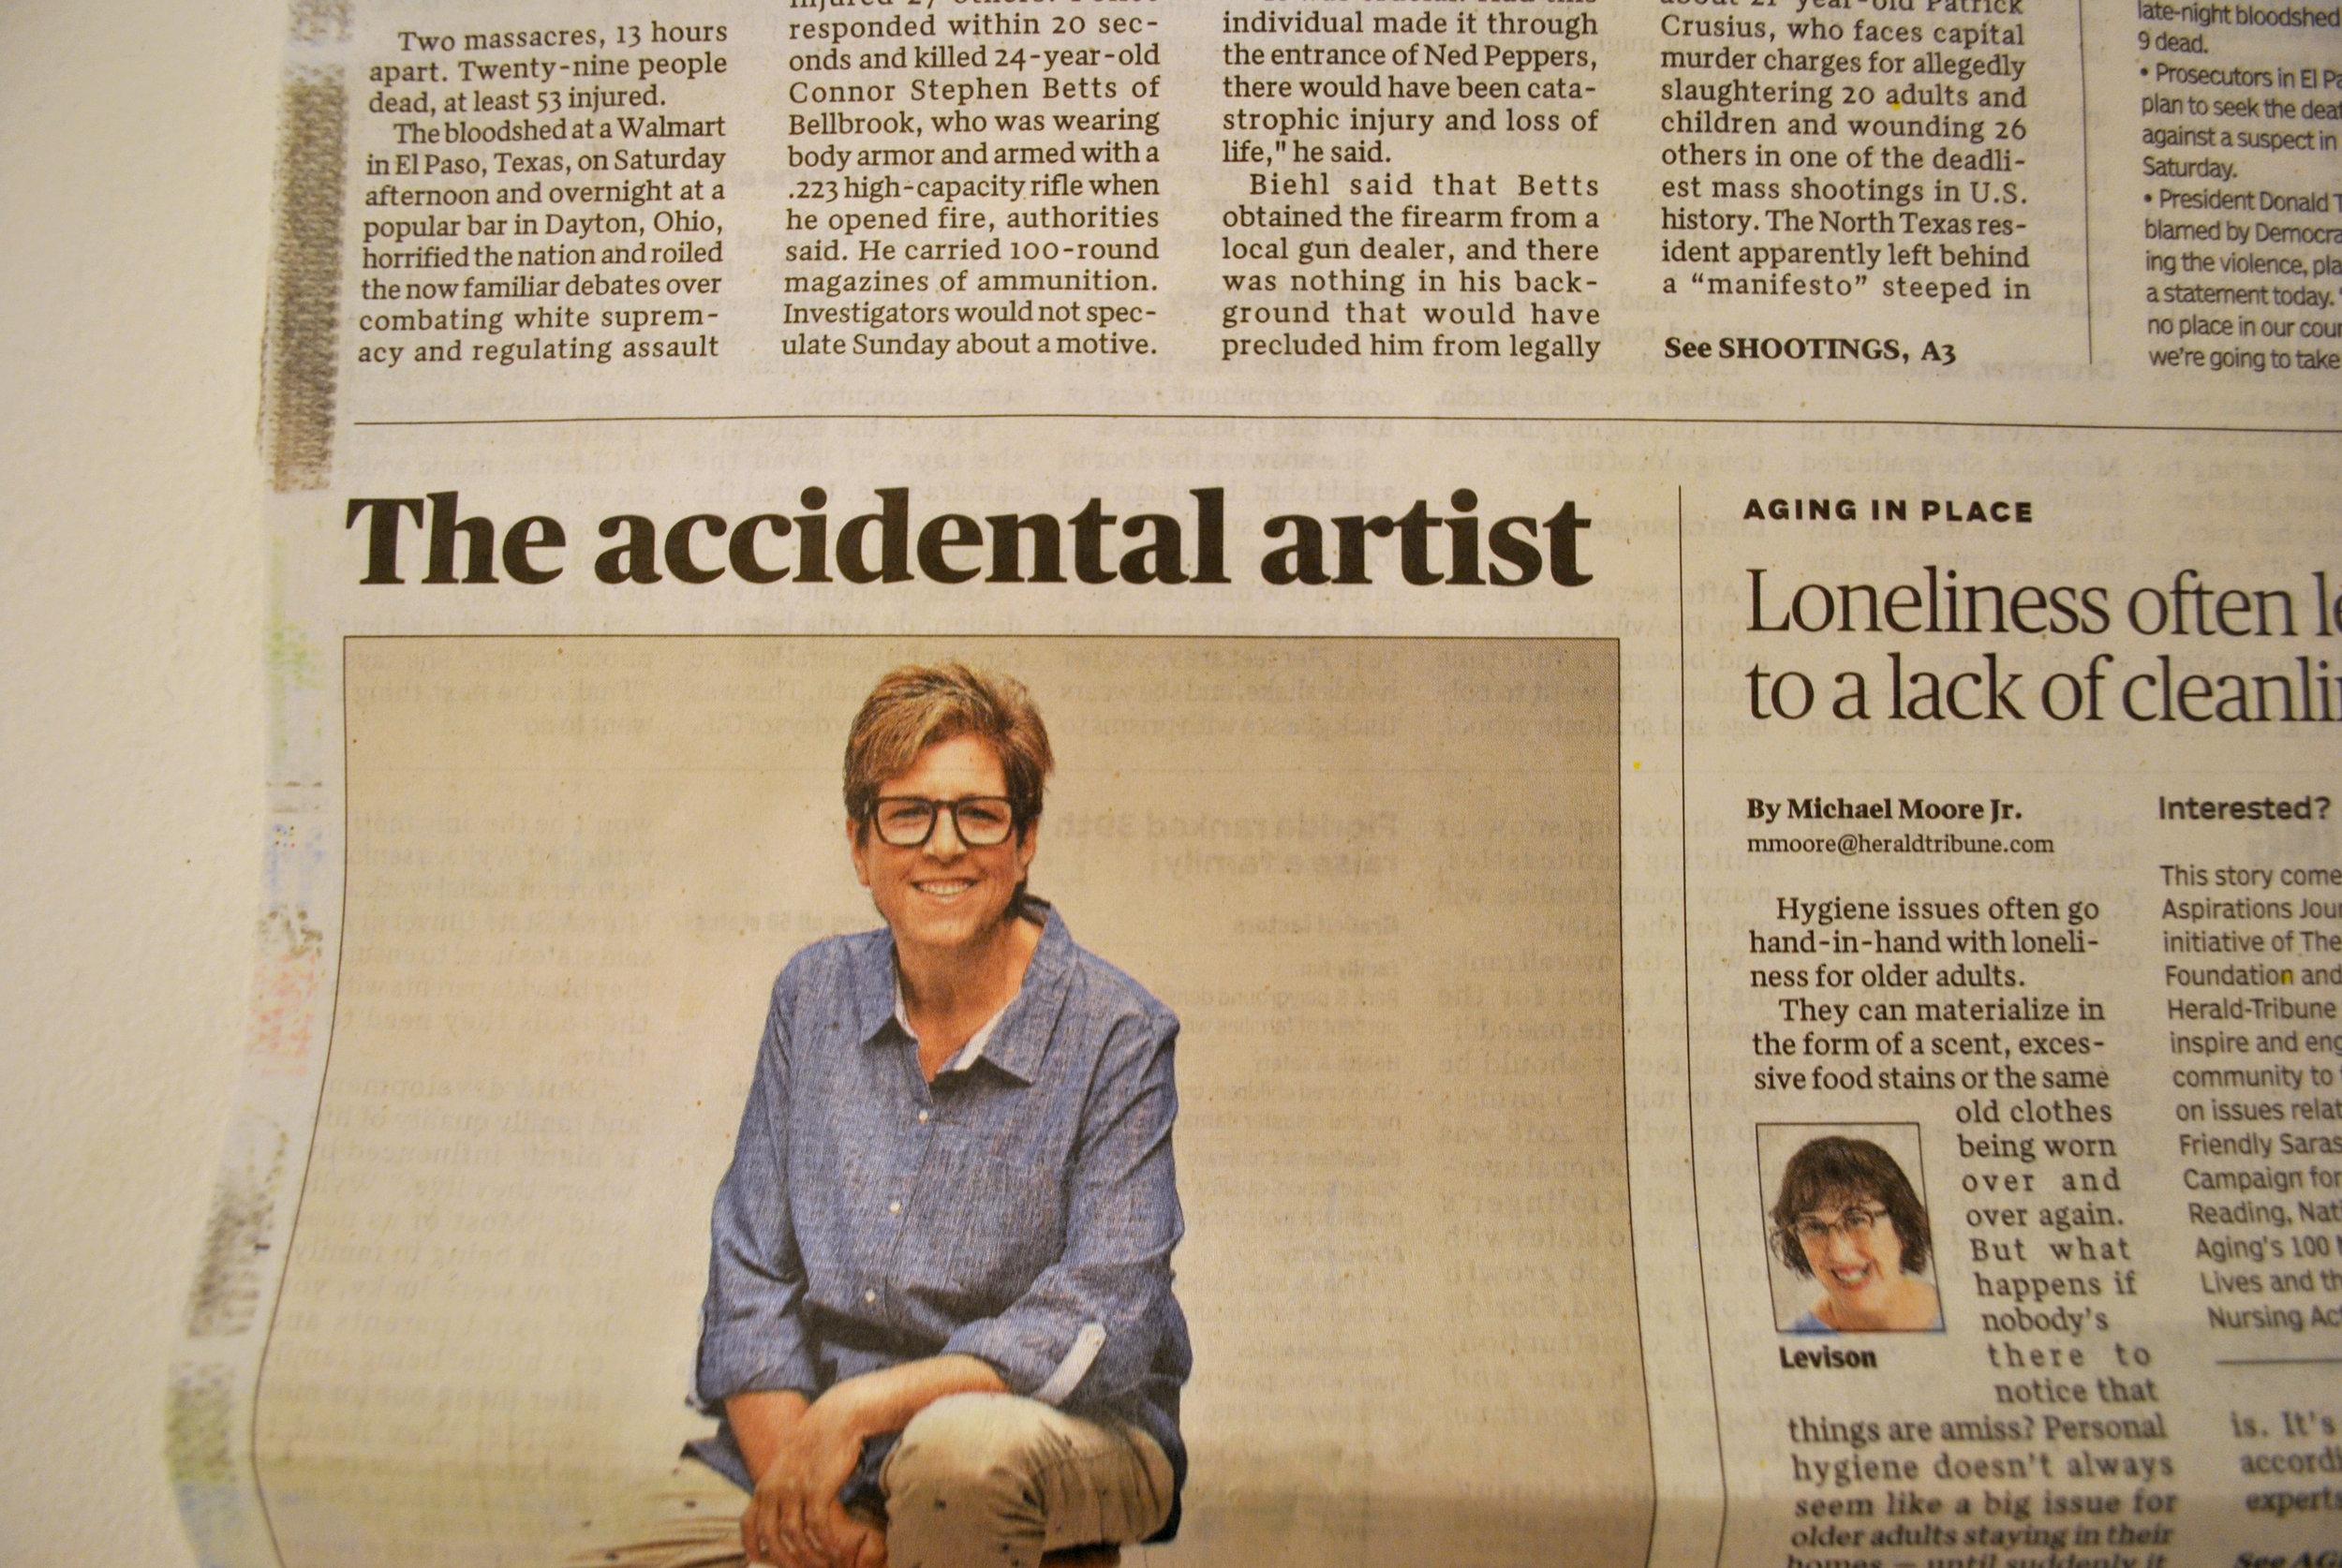 Original Article:  https://www.heraldtribune.com/news/20190805/sarasota-veteran-overcomes-brain-injury-to-become-digital-artist